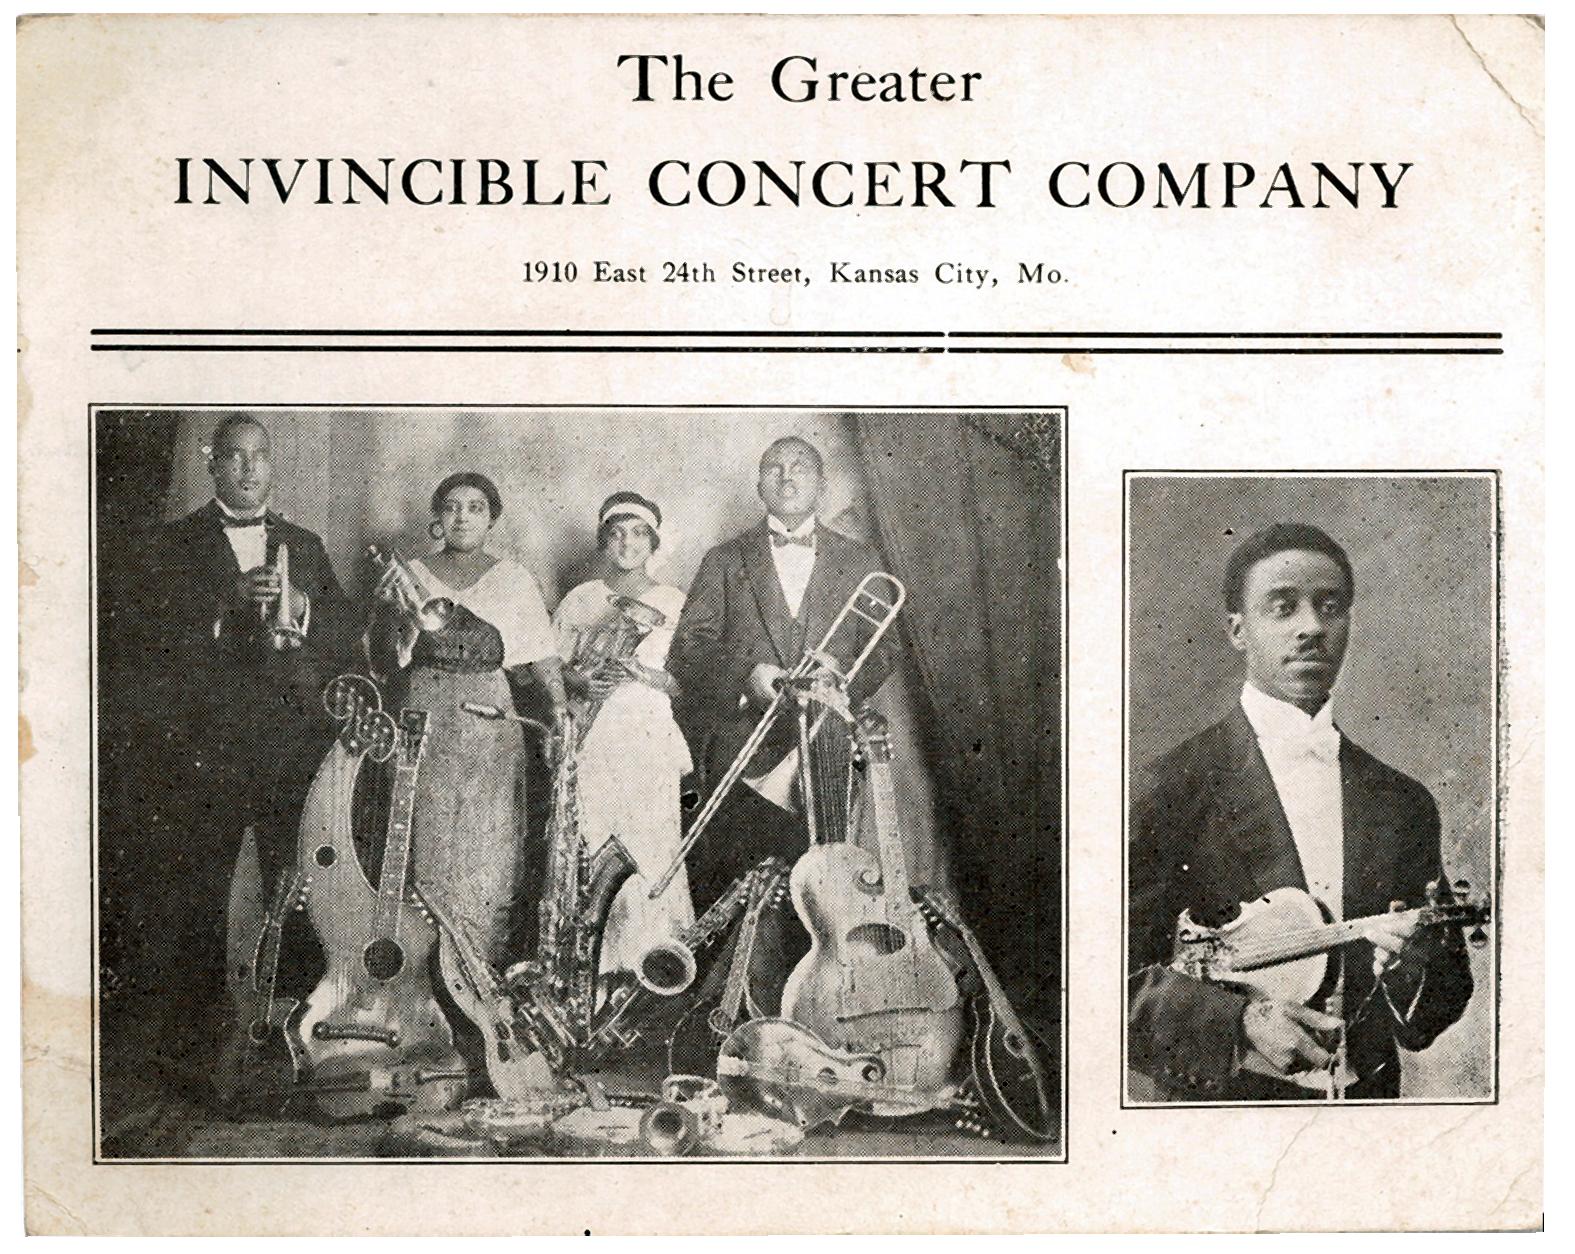 Greater_Invincible_Concert_Company,Kansas_City,Missouri-carter